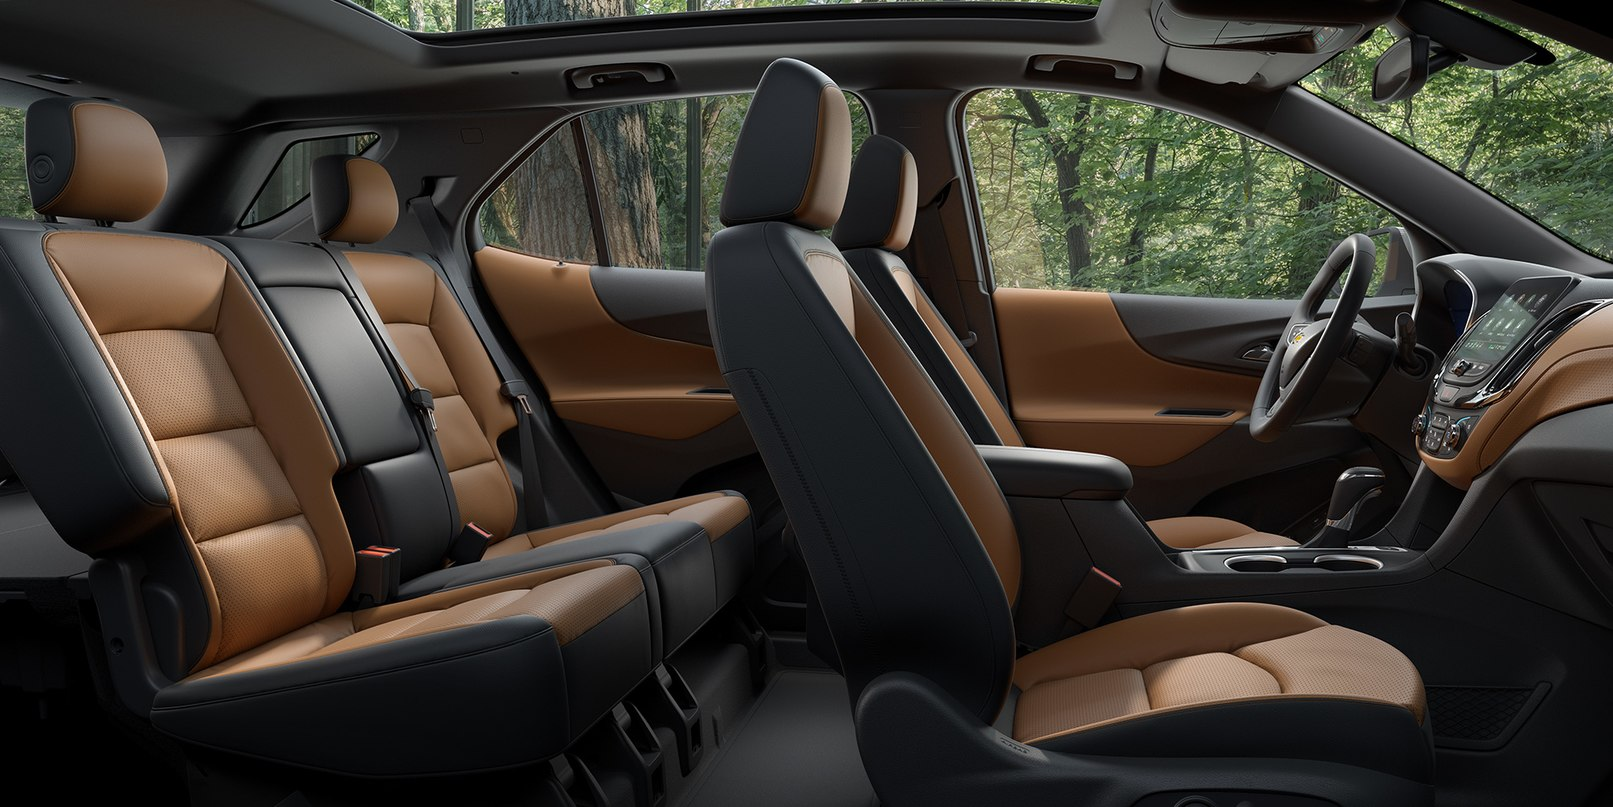 2020 Chevrolet Equinox Cabin